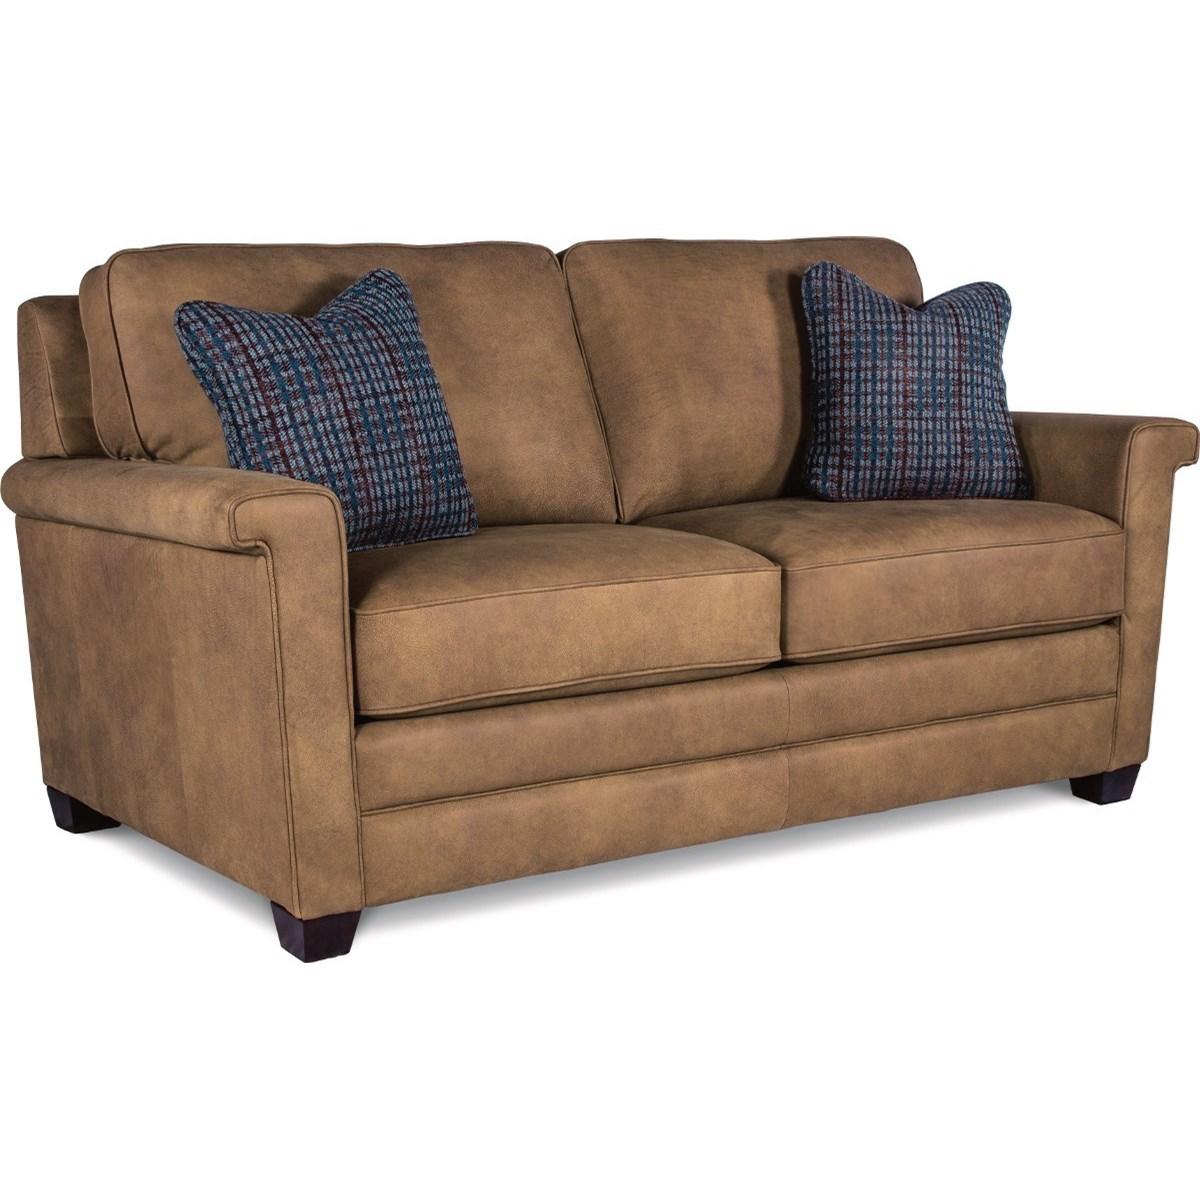 la z boy bexley contemporary apartment size sofa lindy 39 s. Black Bedroom Furniture Sets. Home Design Ideas